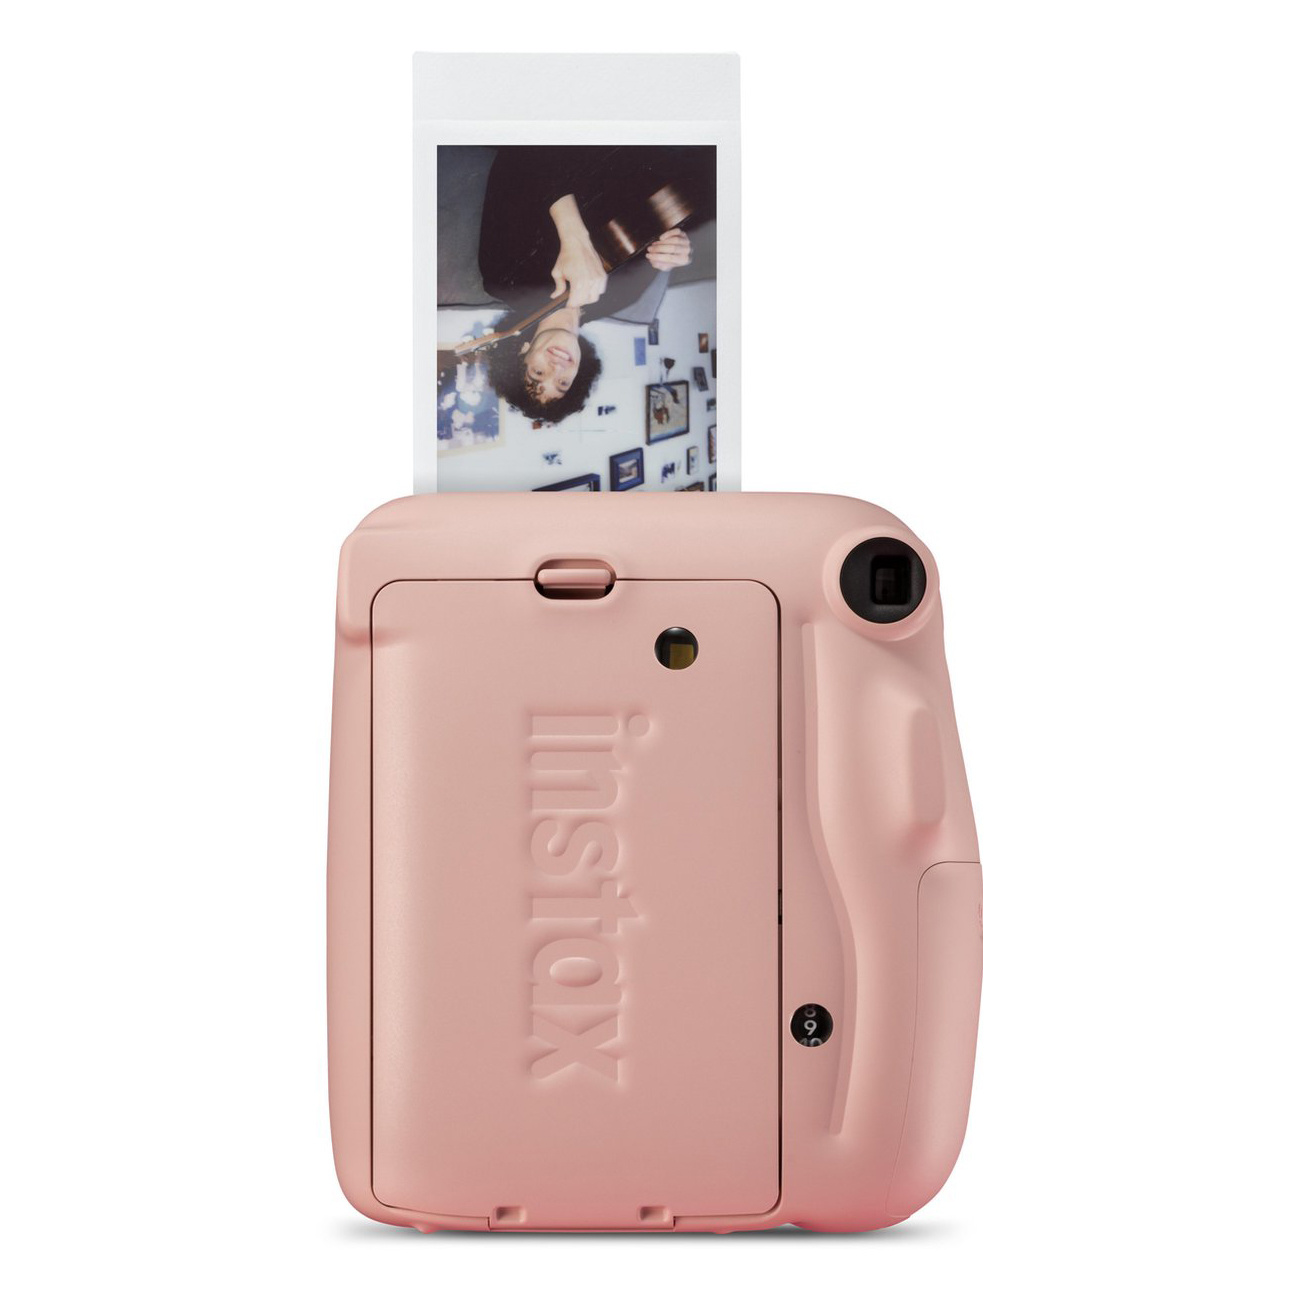 FujiFilm Instax Mini 11 Roos